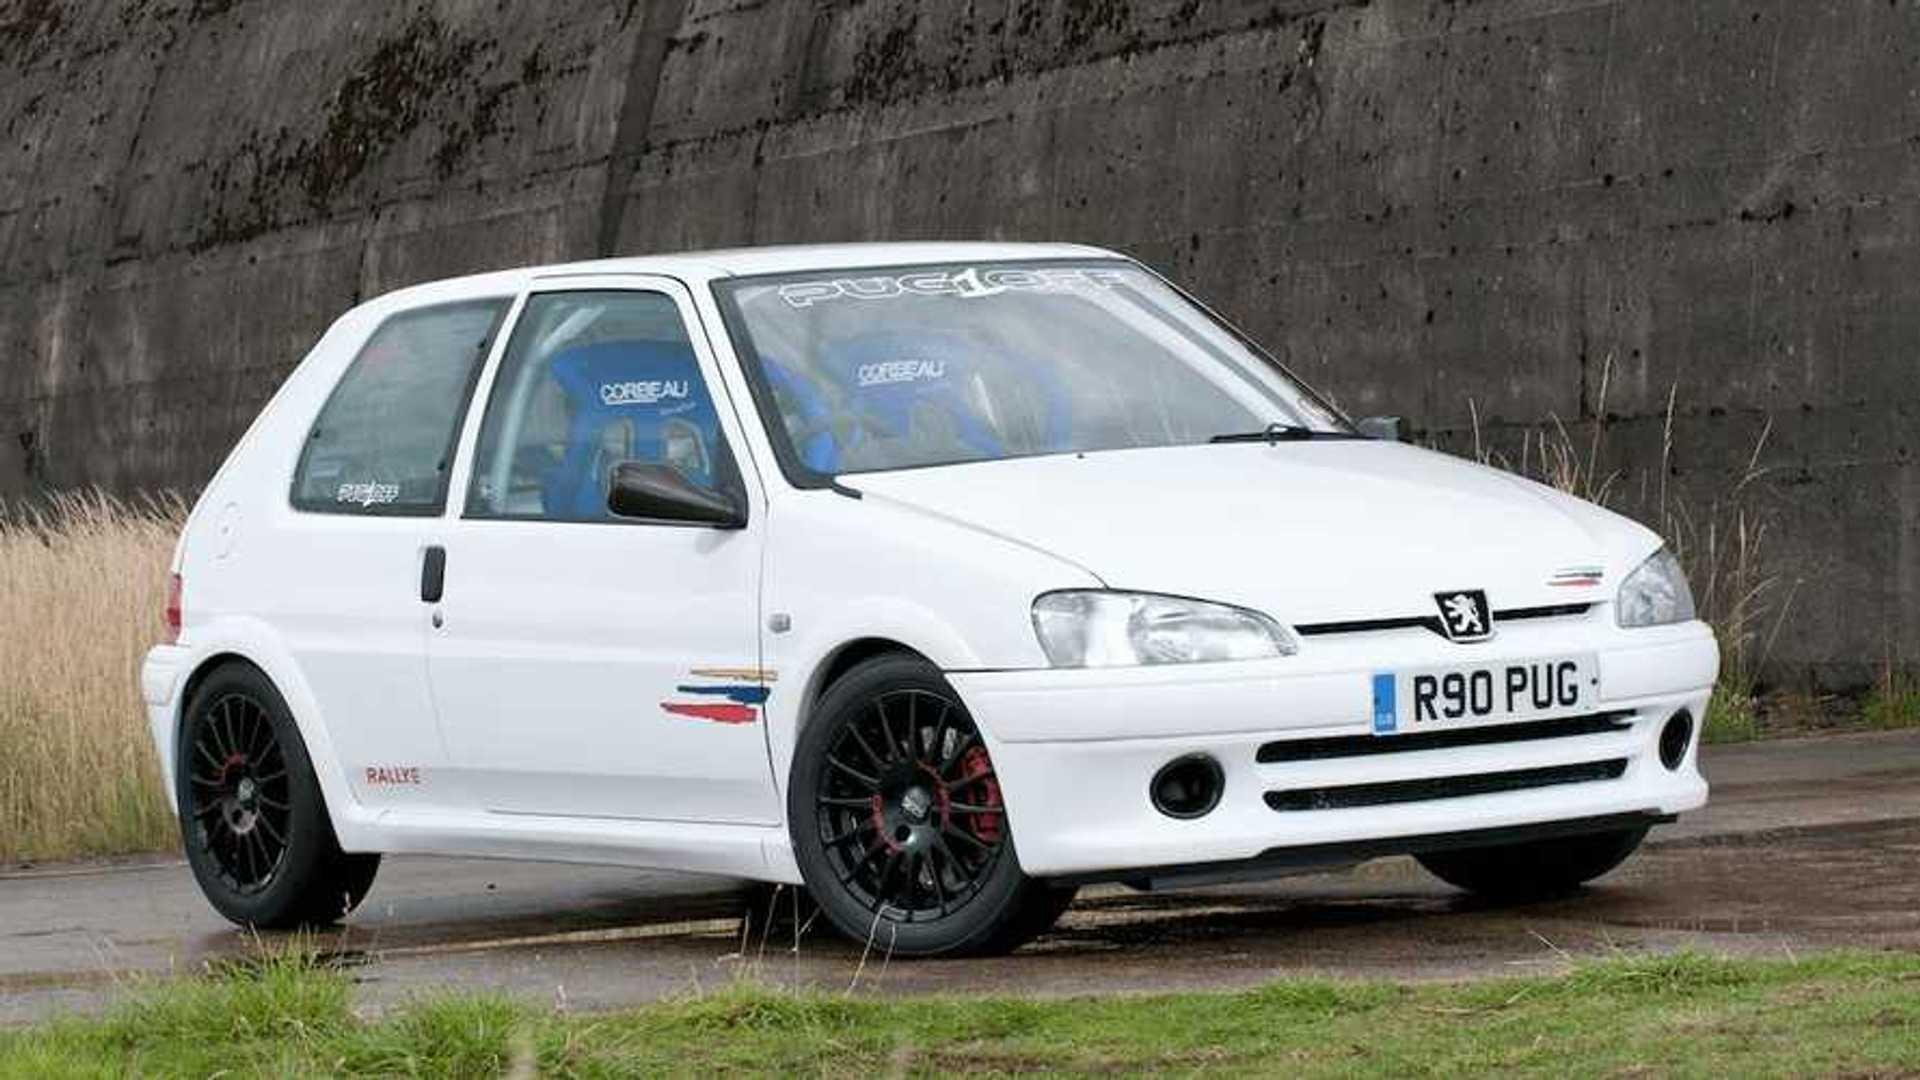 Peugeot 106 Rallye Buying Guide